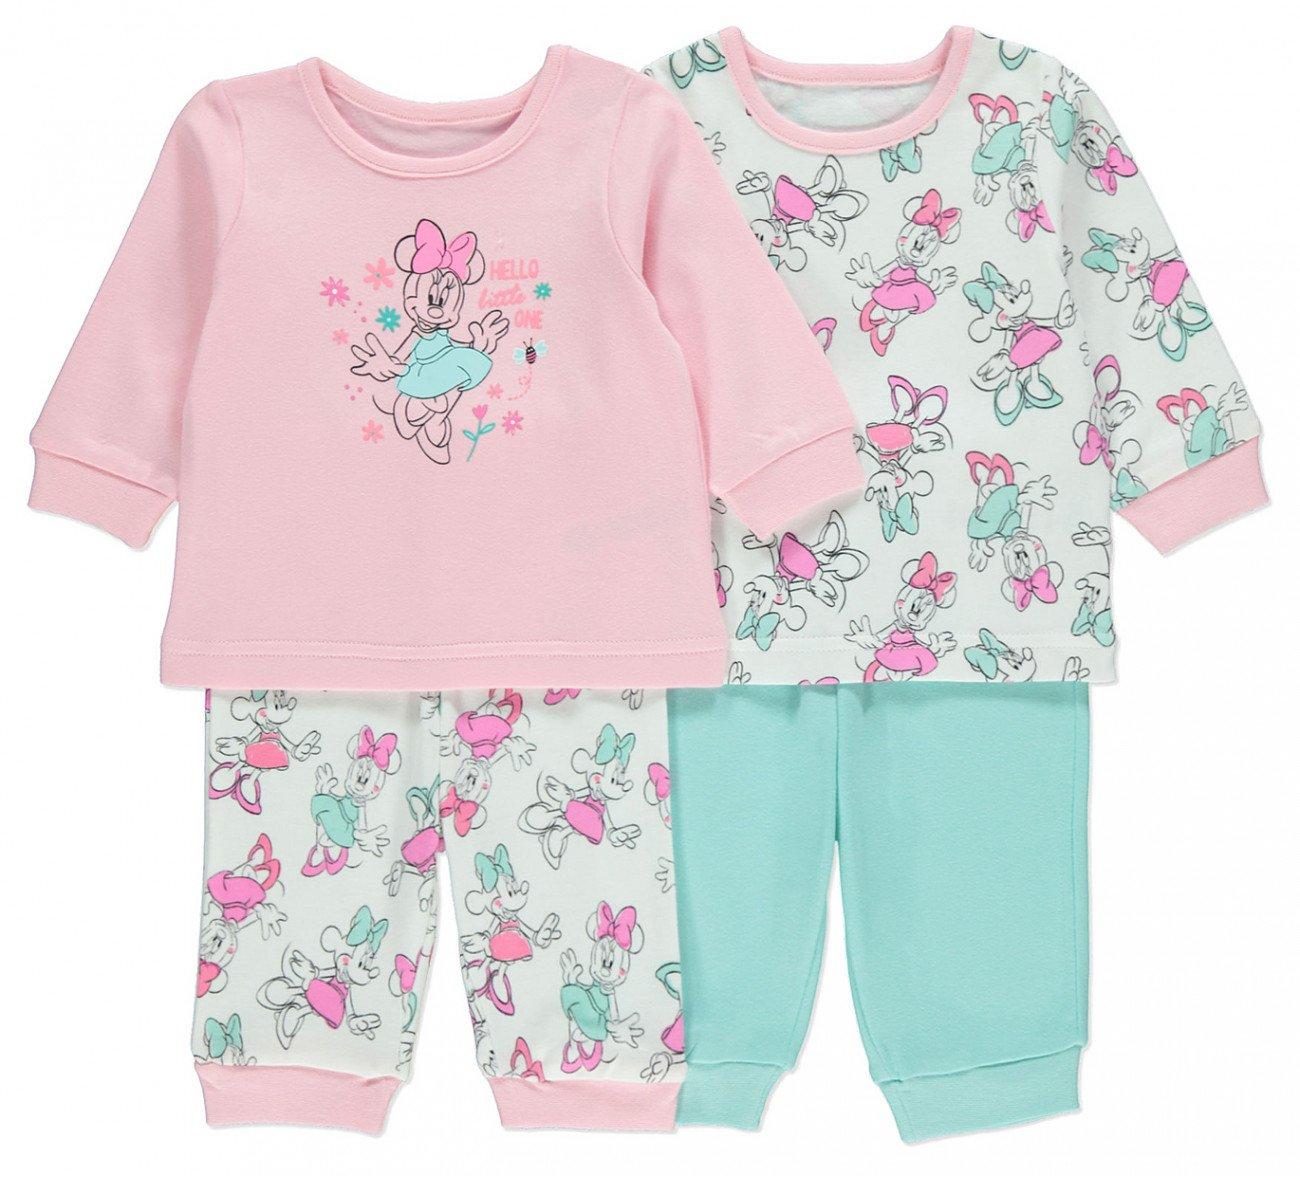 dd7a216bd10e7 Комплект из двух пижам для девочки